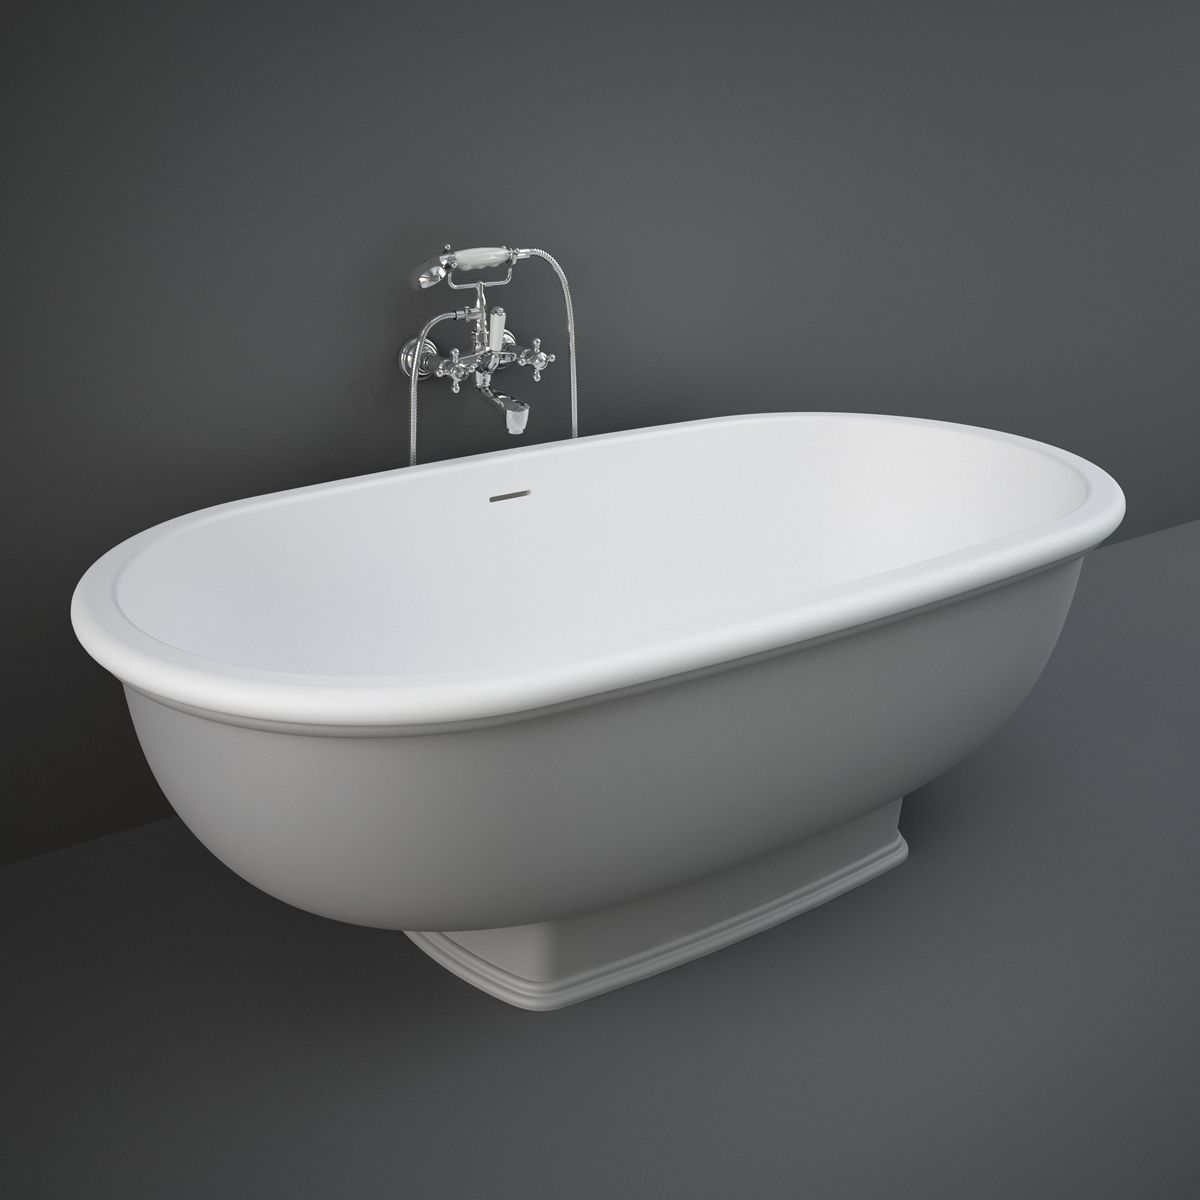 RAK Washington Grey Freestanding Bath 1560mm